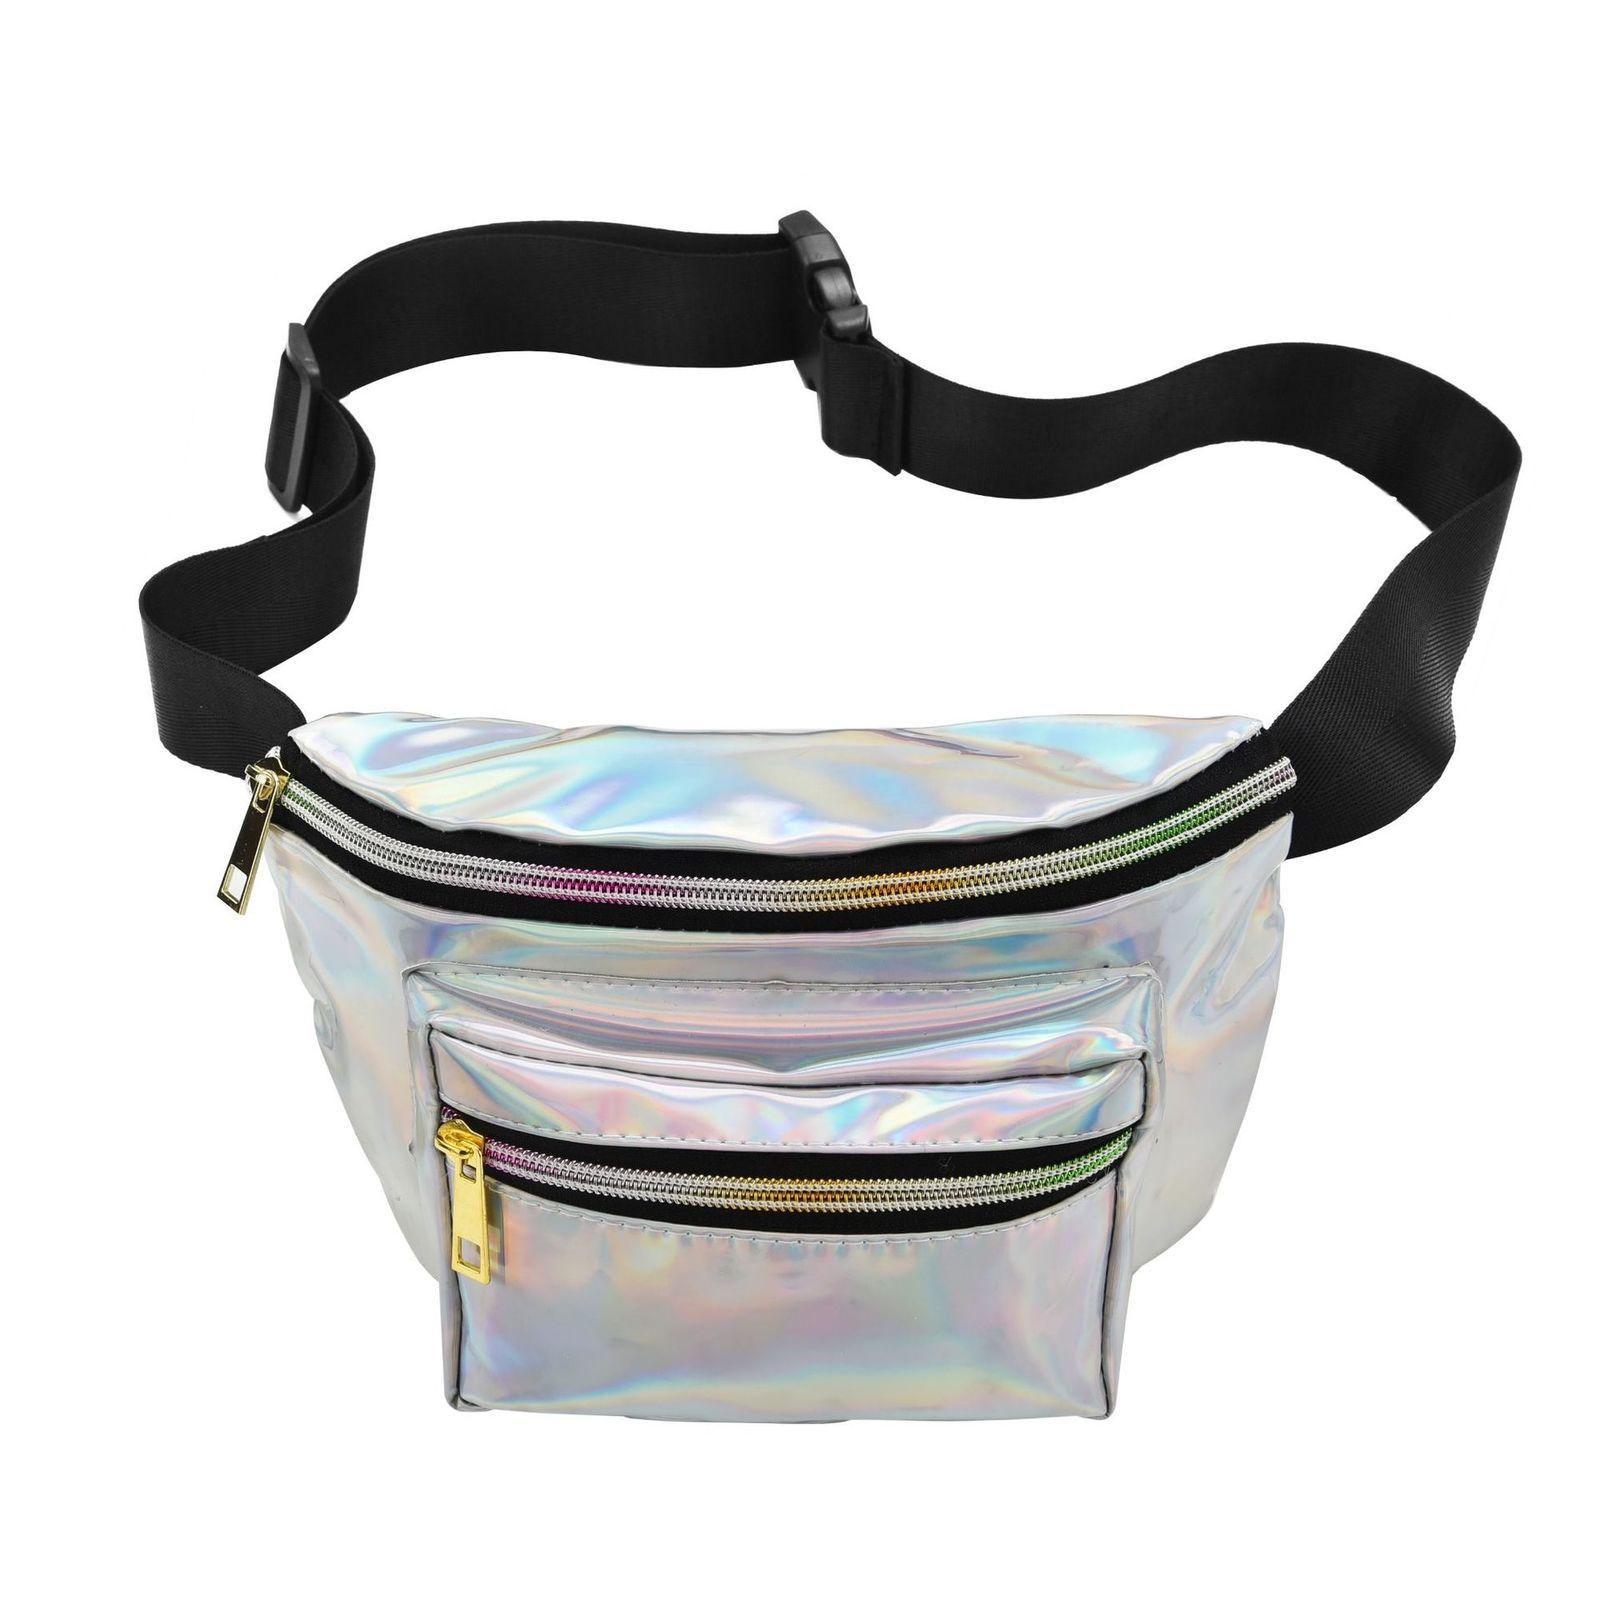 2018 New Holographic Fanny Pack For Women Laser Waist Packs Belt Bag Silver Gold Pink Bum Bag 2018 new punk lady girl rainbow pvc laser transparent fanny pack women bum bag belt bag silver black